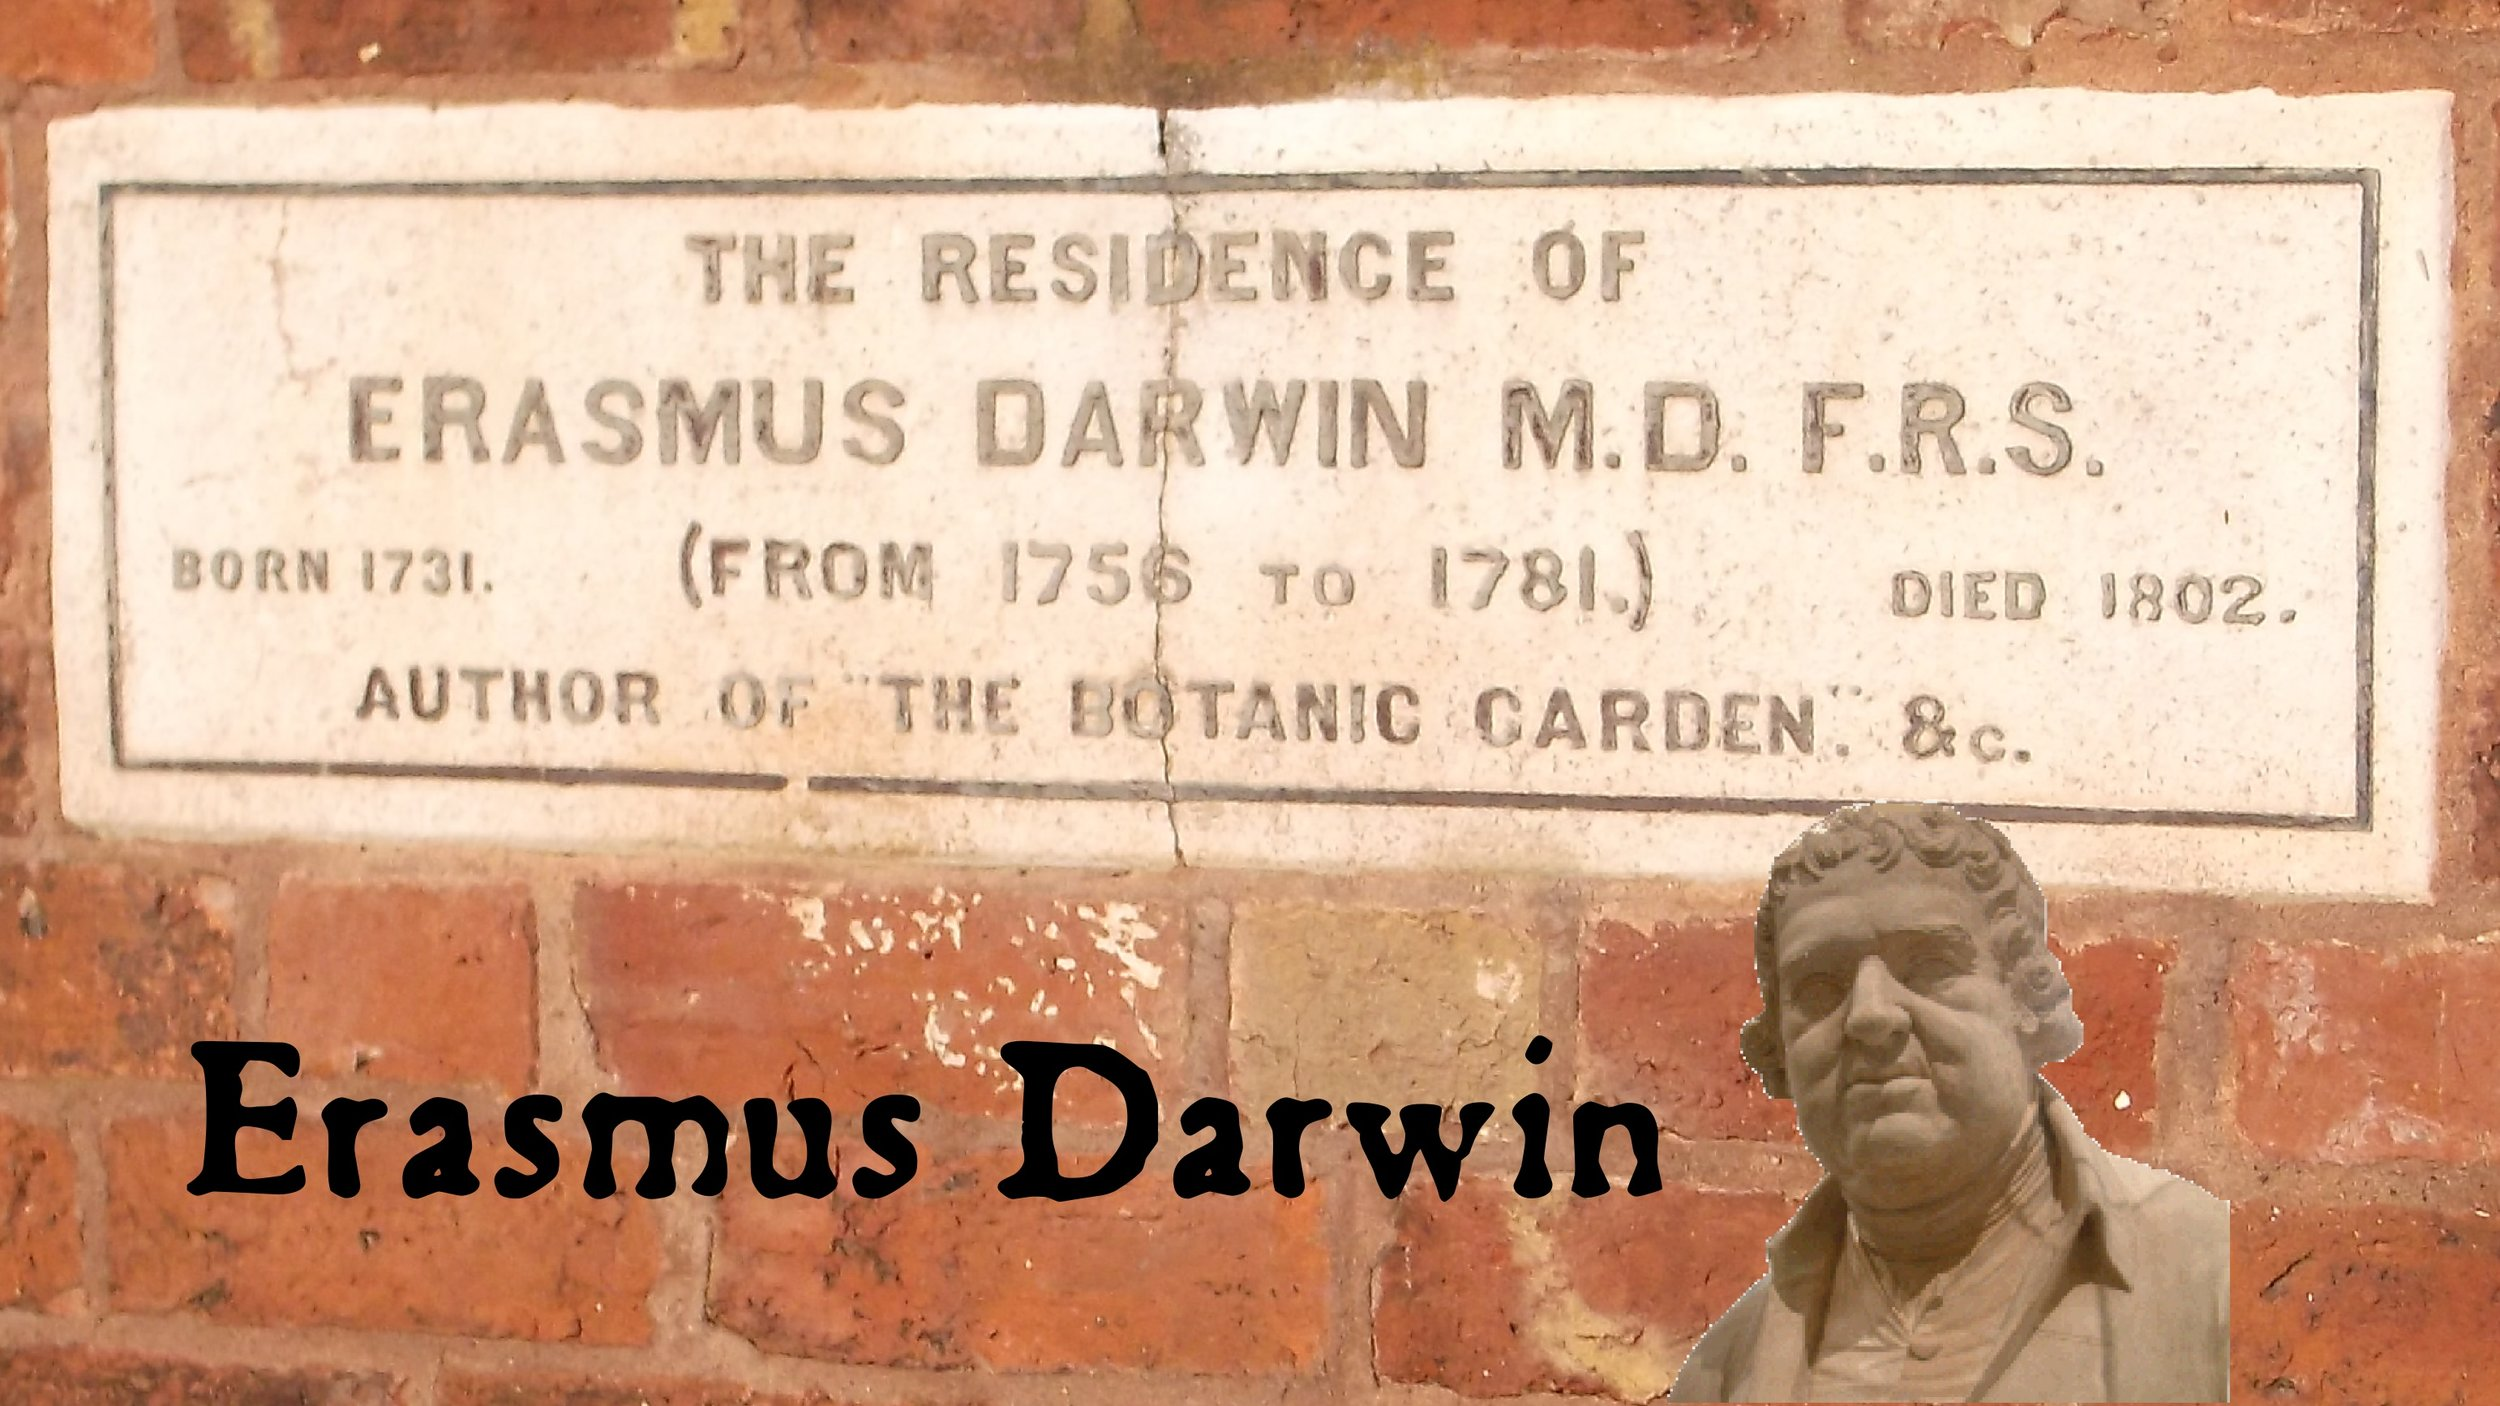 Erasmus Darwin thumb1.jpg